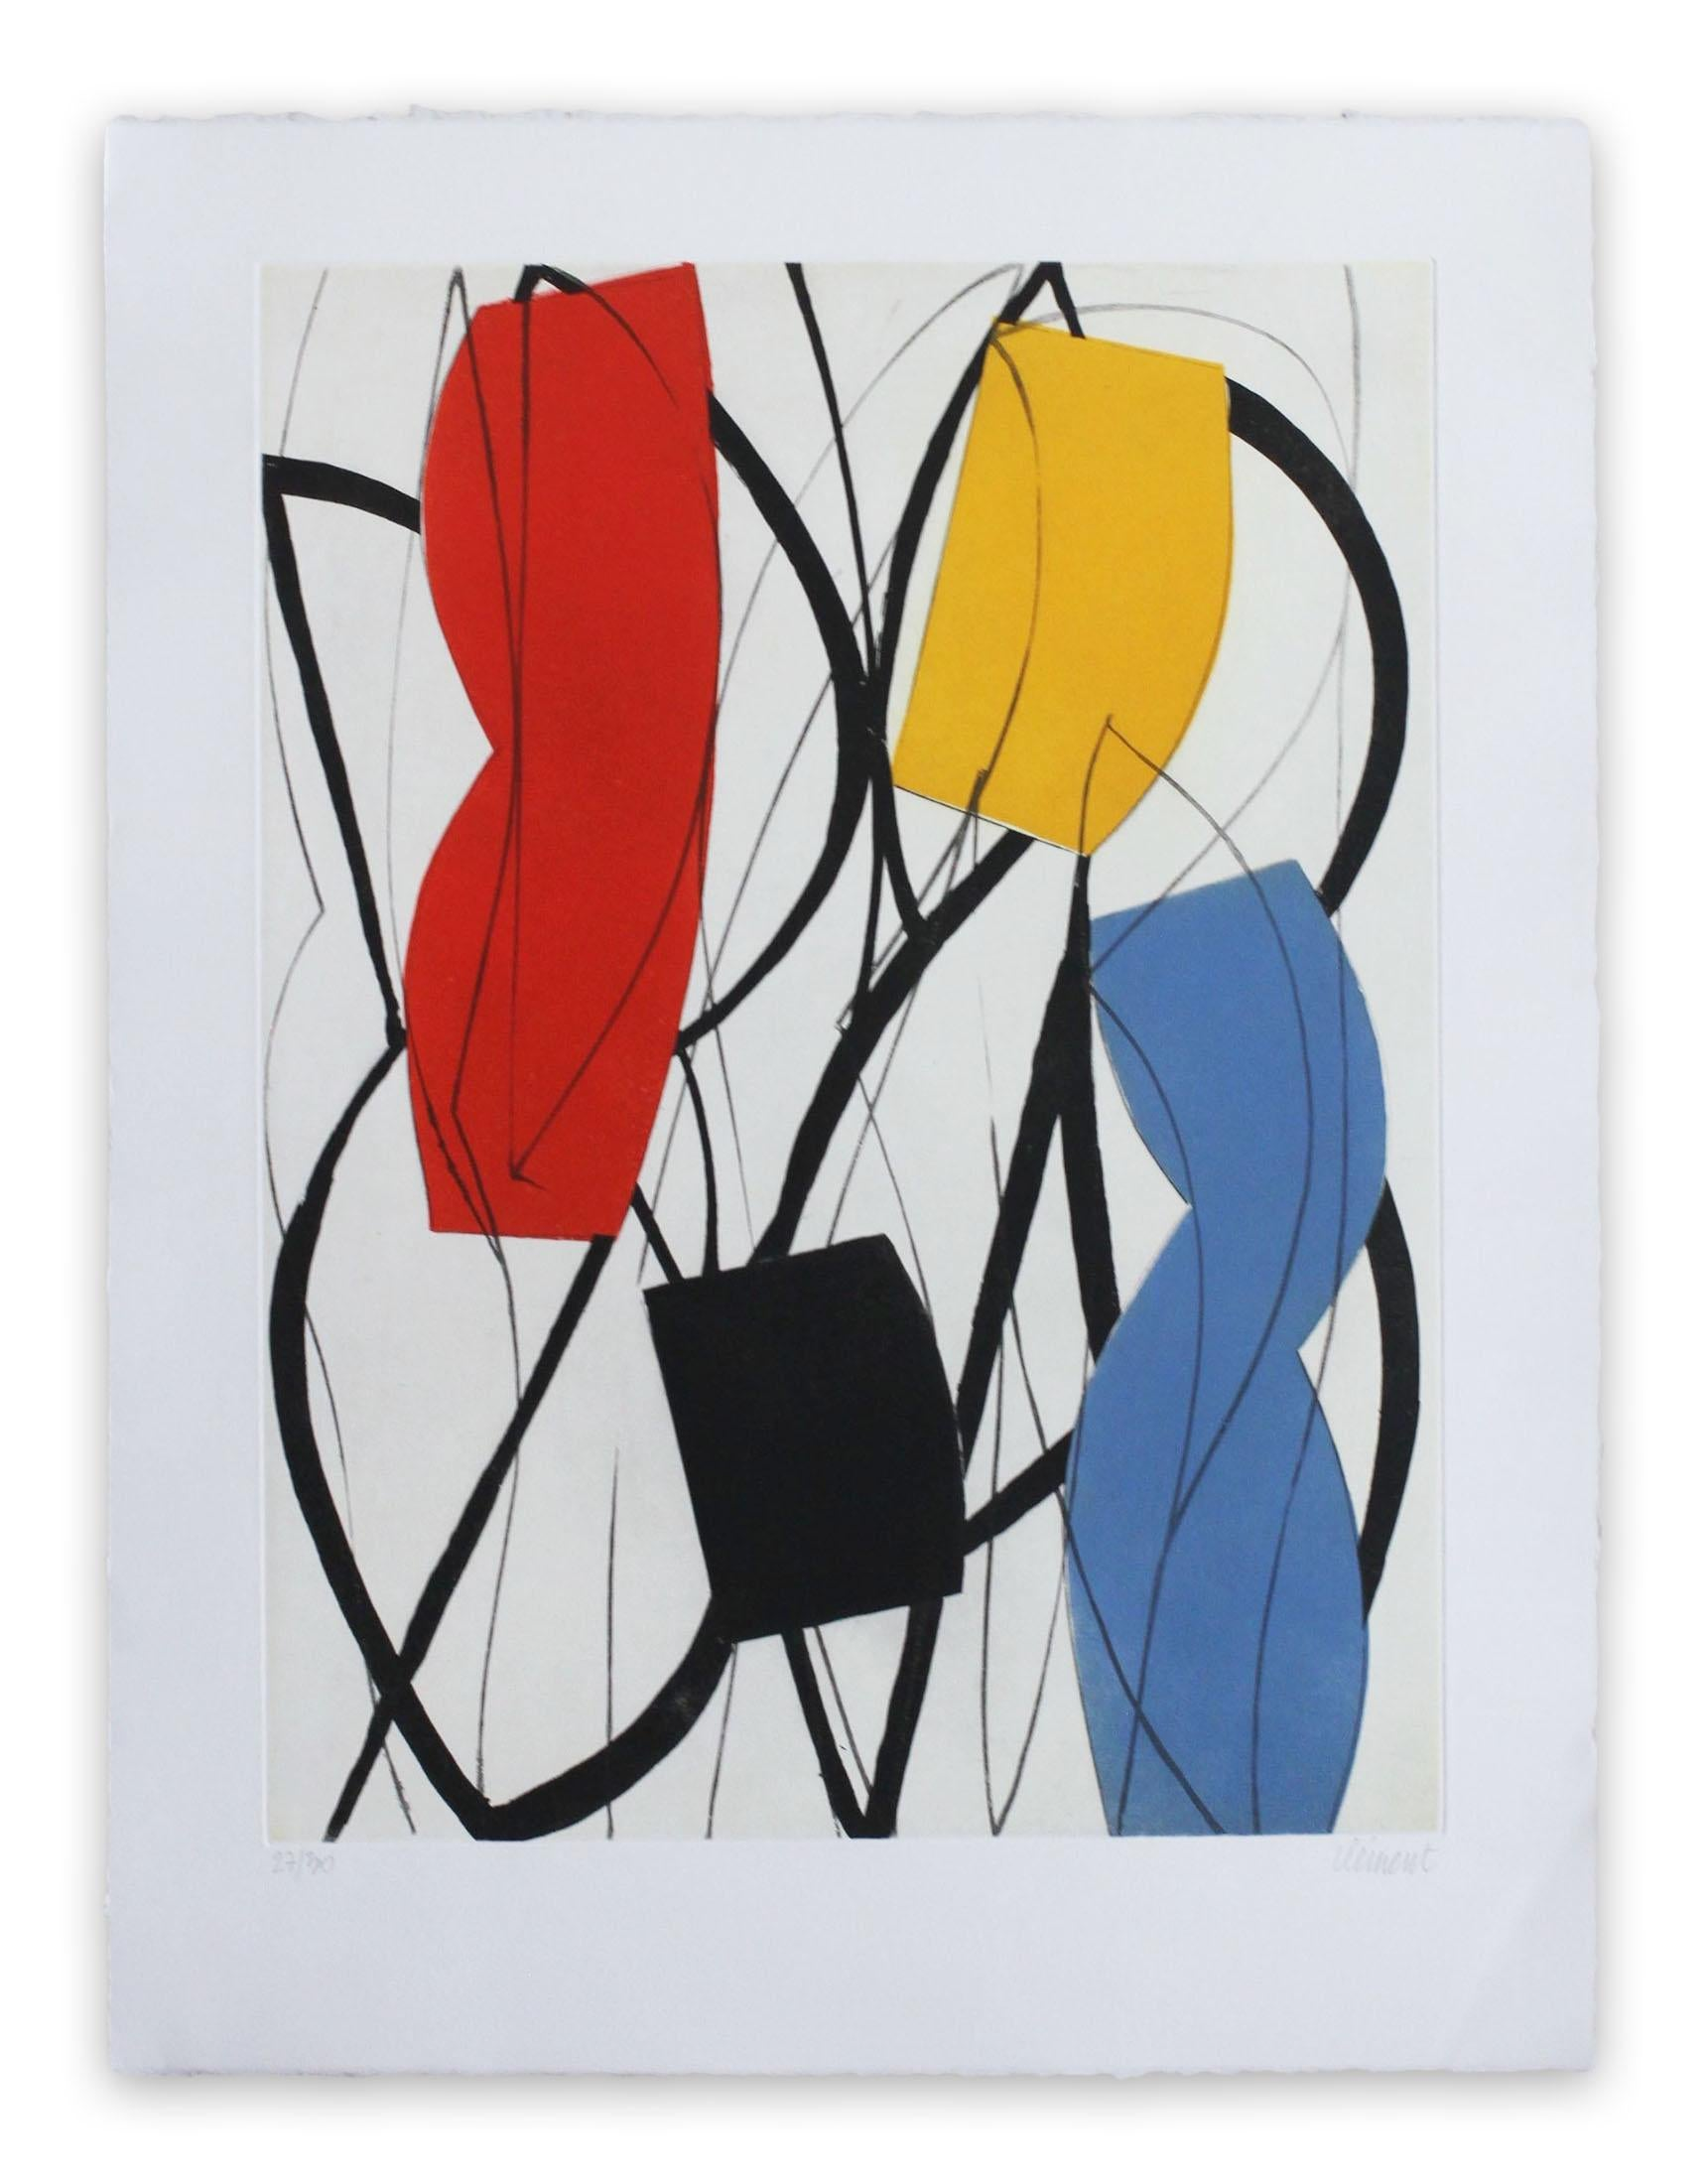 13F3G-2013 (Abstract print)